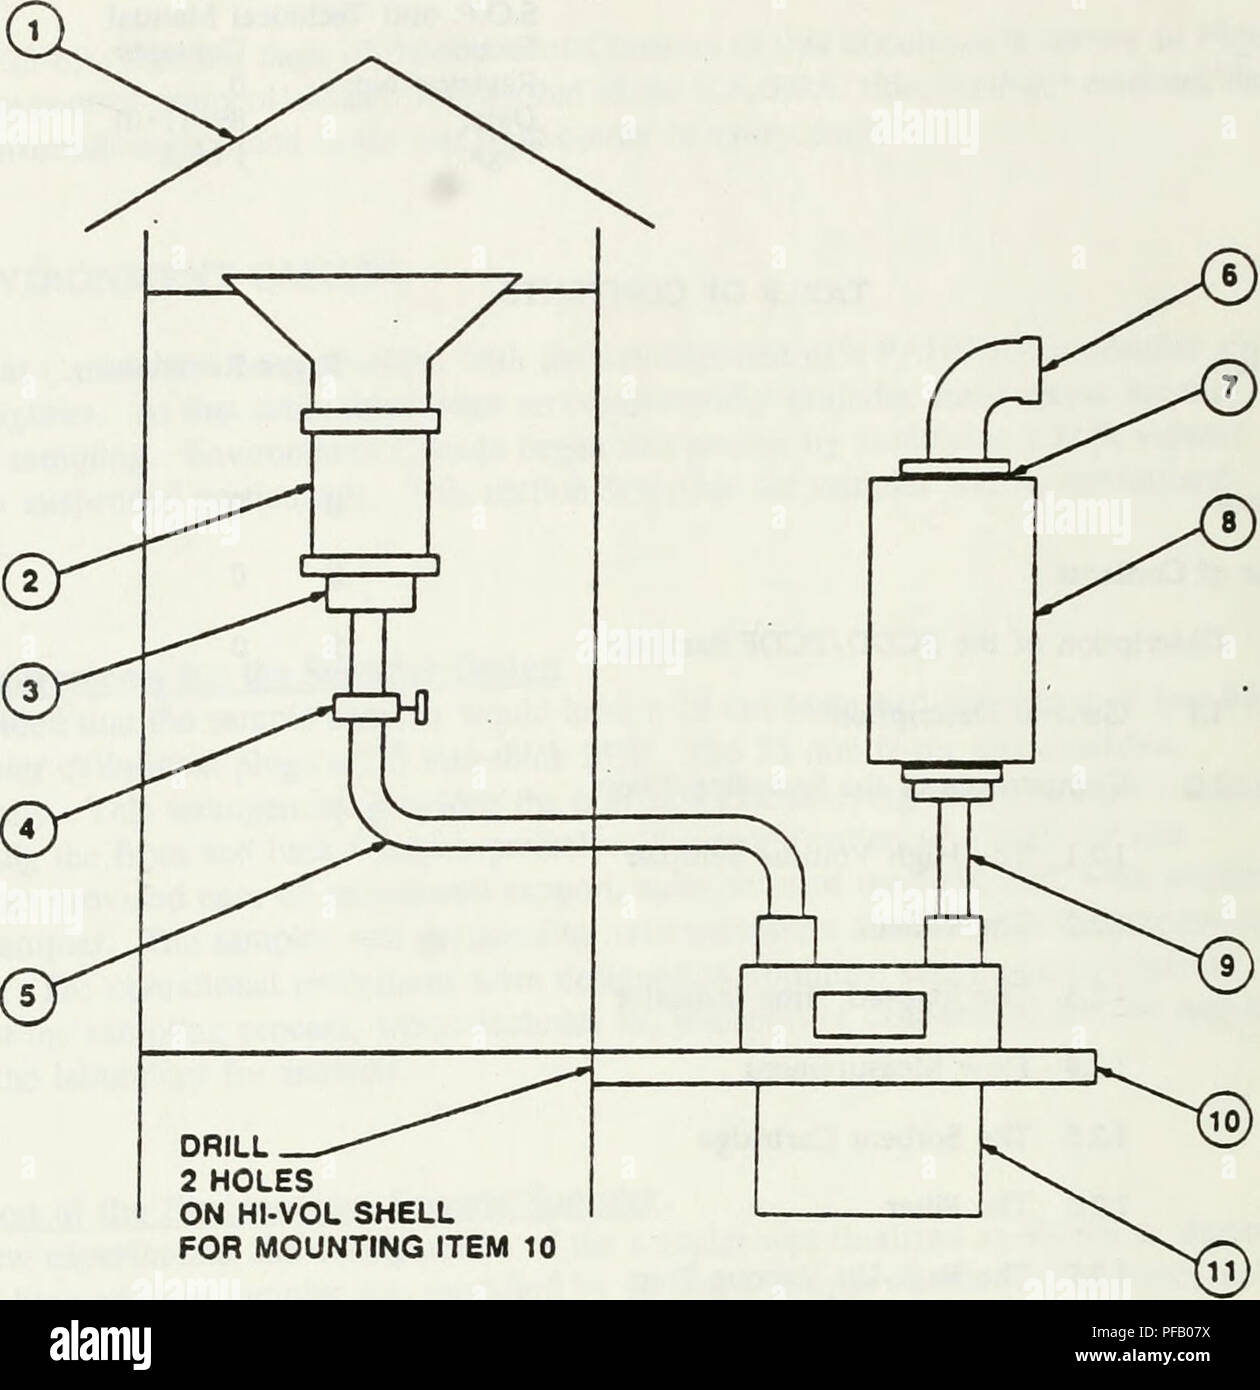 Determination of chlorinated dibenzo-p-dioxins and chlorinated